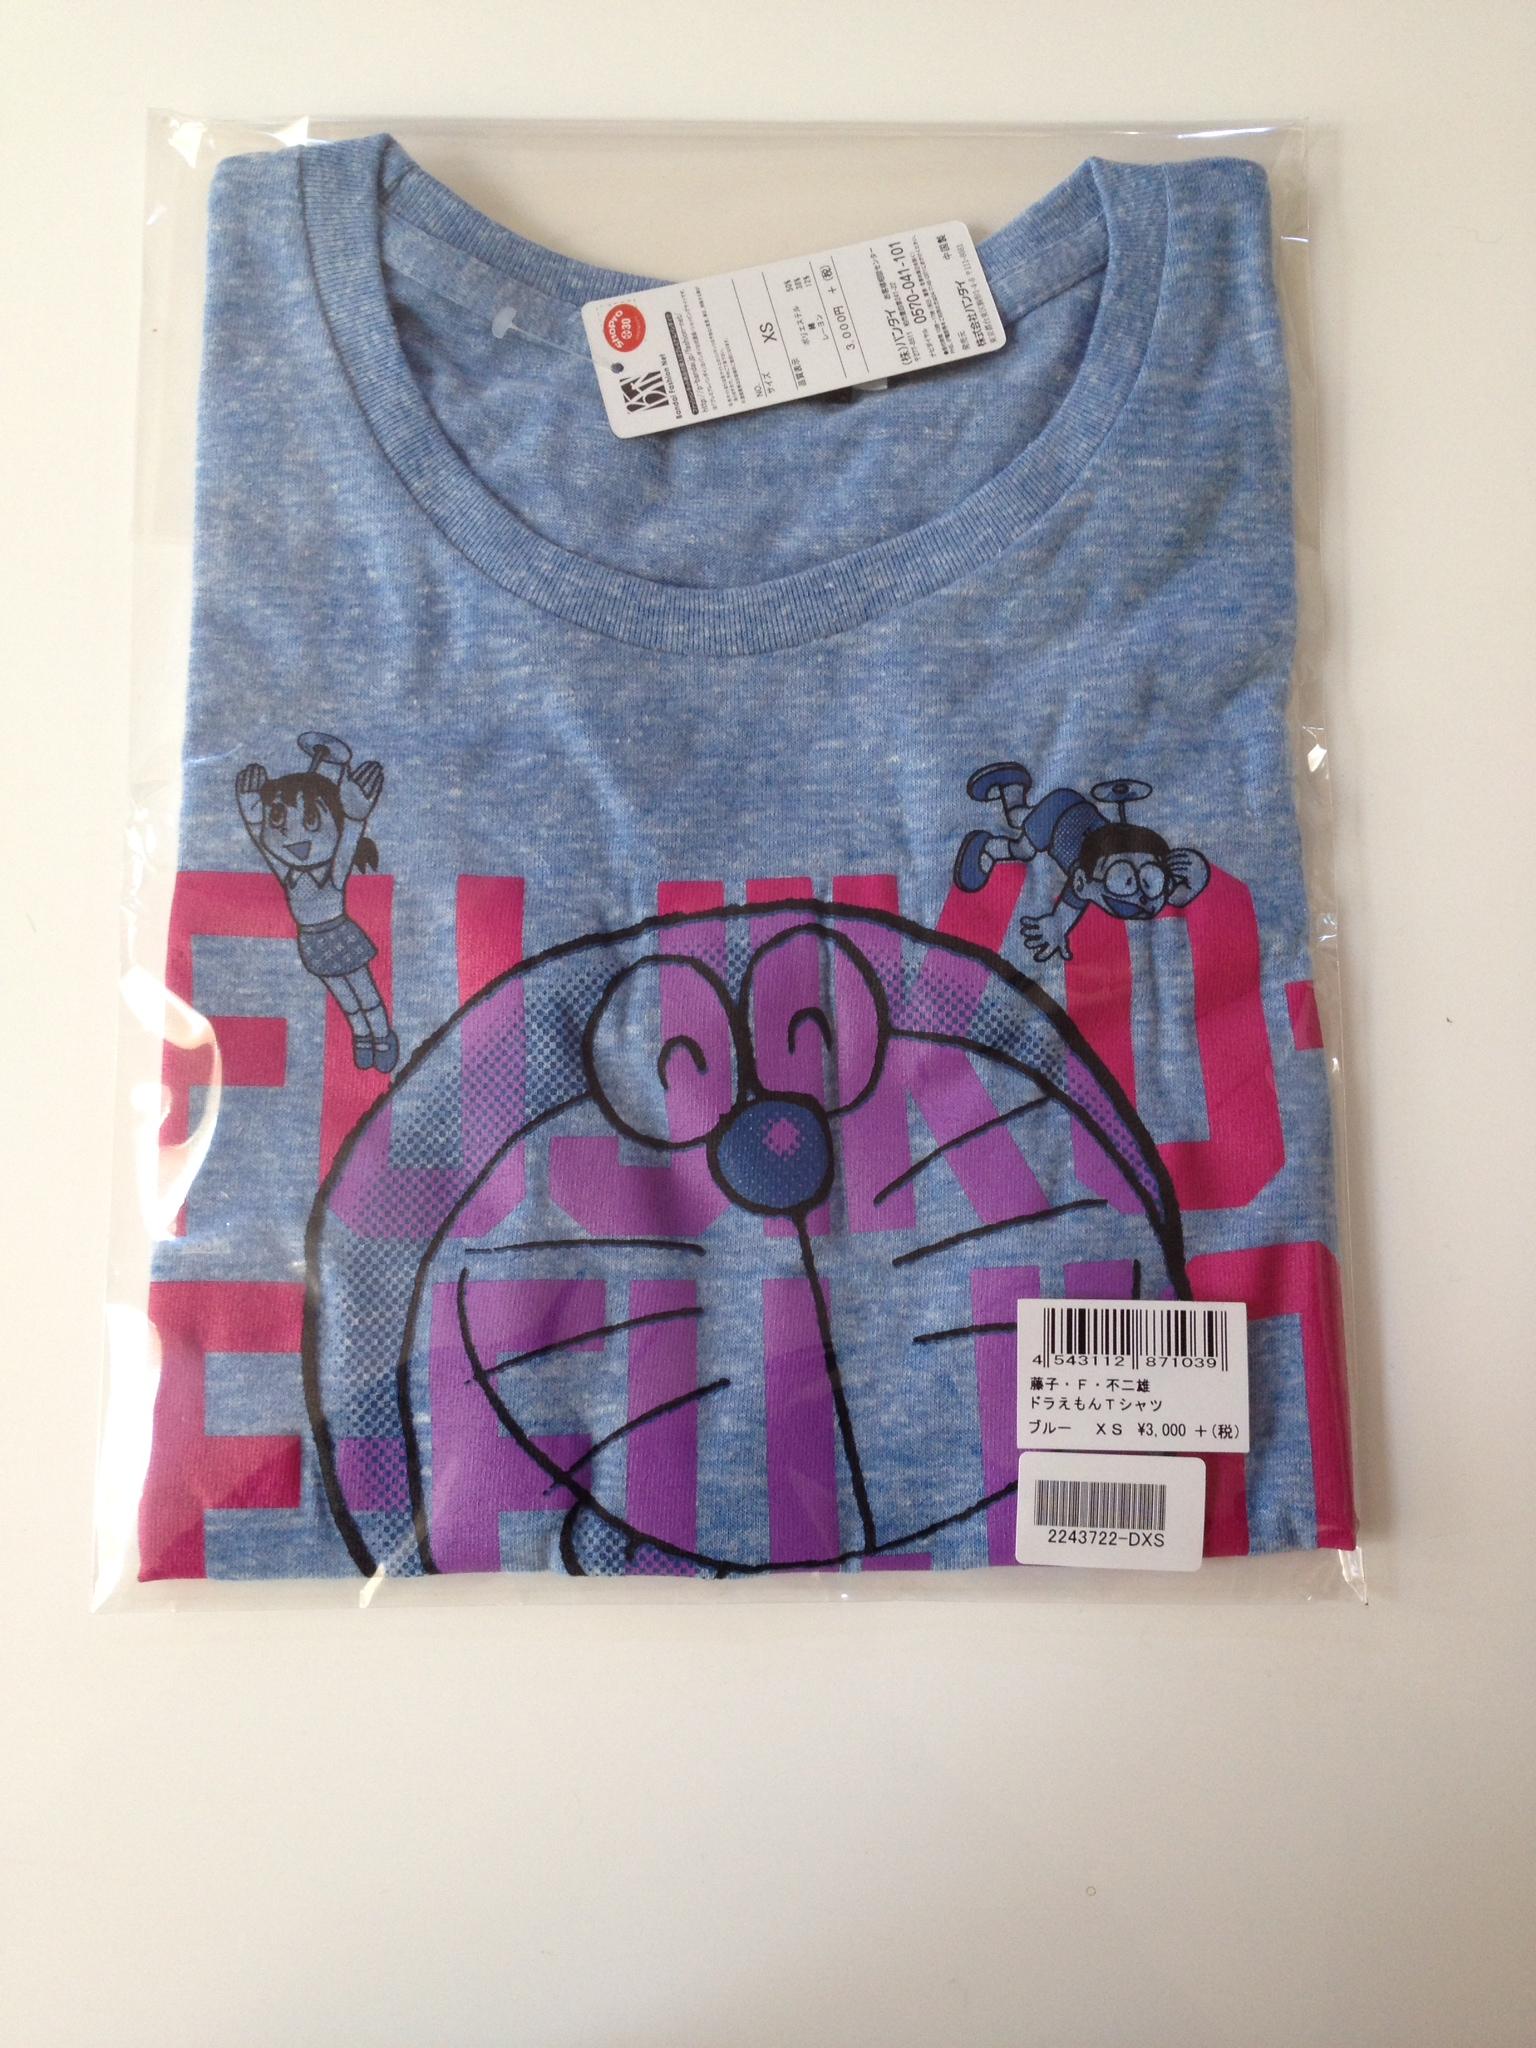 Fujiko F. Fujio 80th Anniversary Doraemon T-shirt